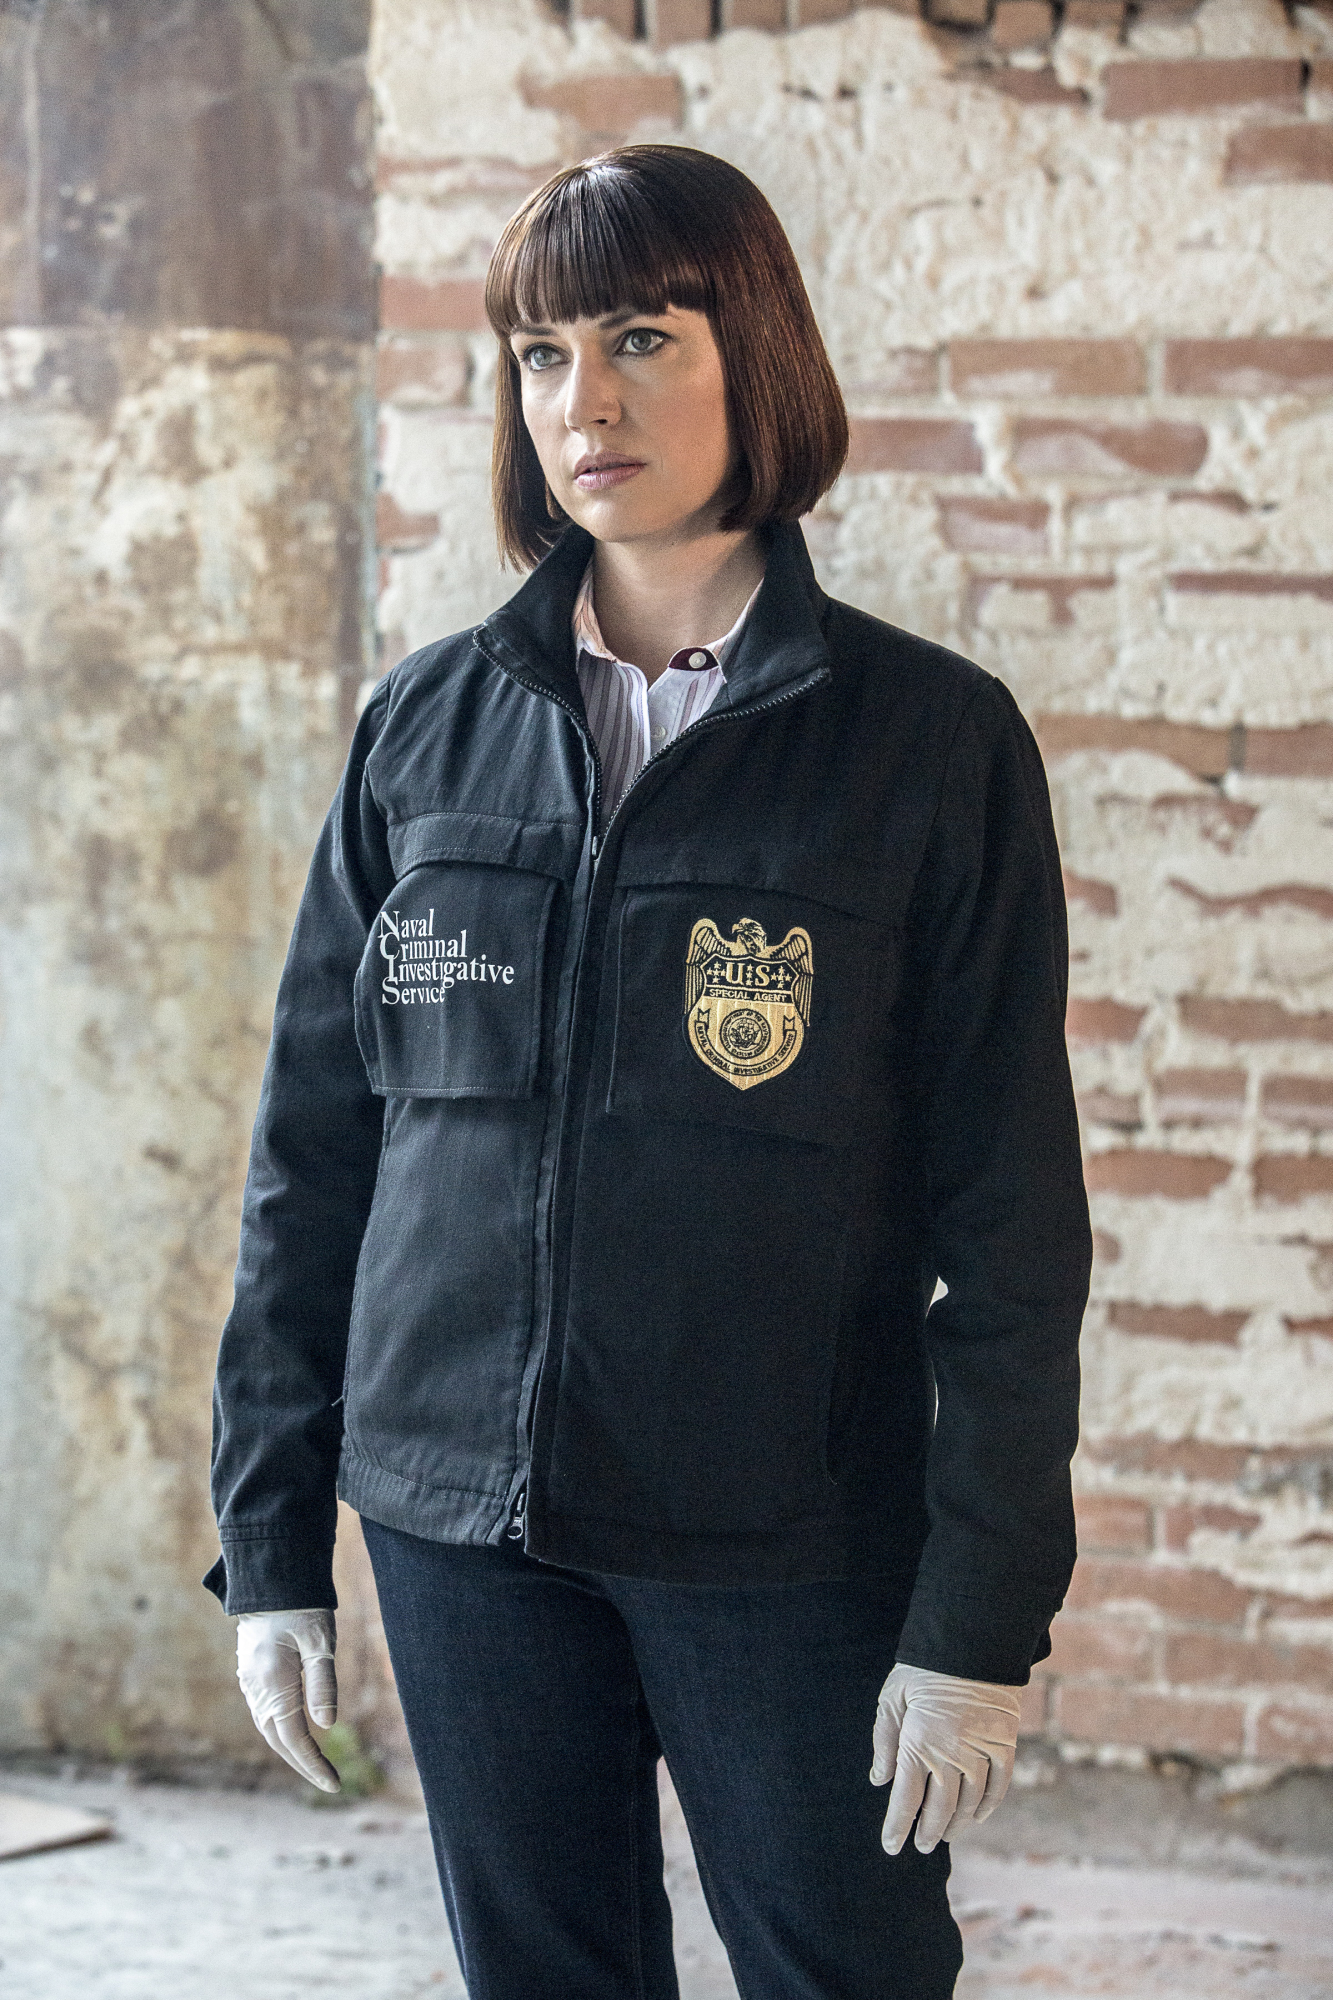 Julie Ann Emery as NCIS Special Agent Karen Hardy